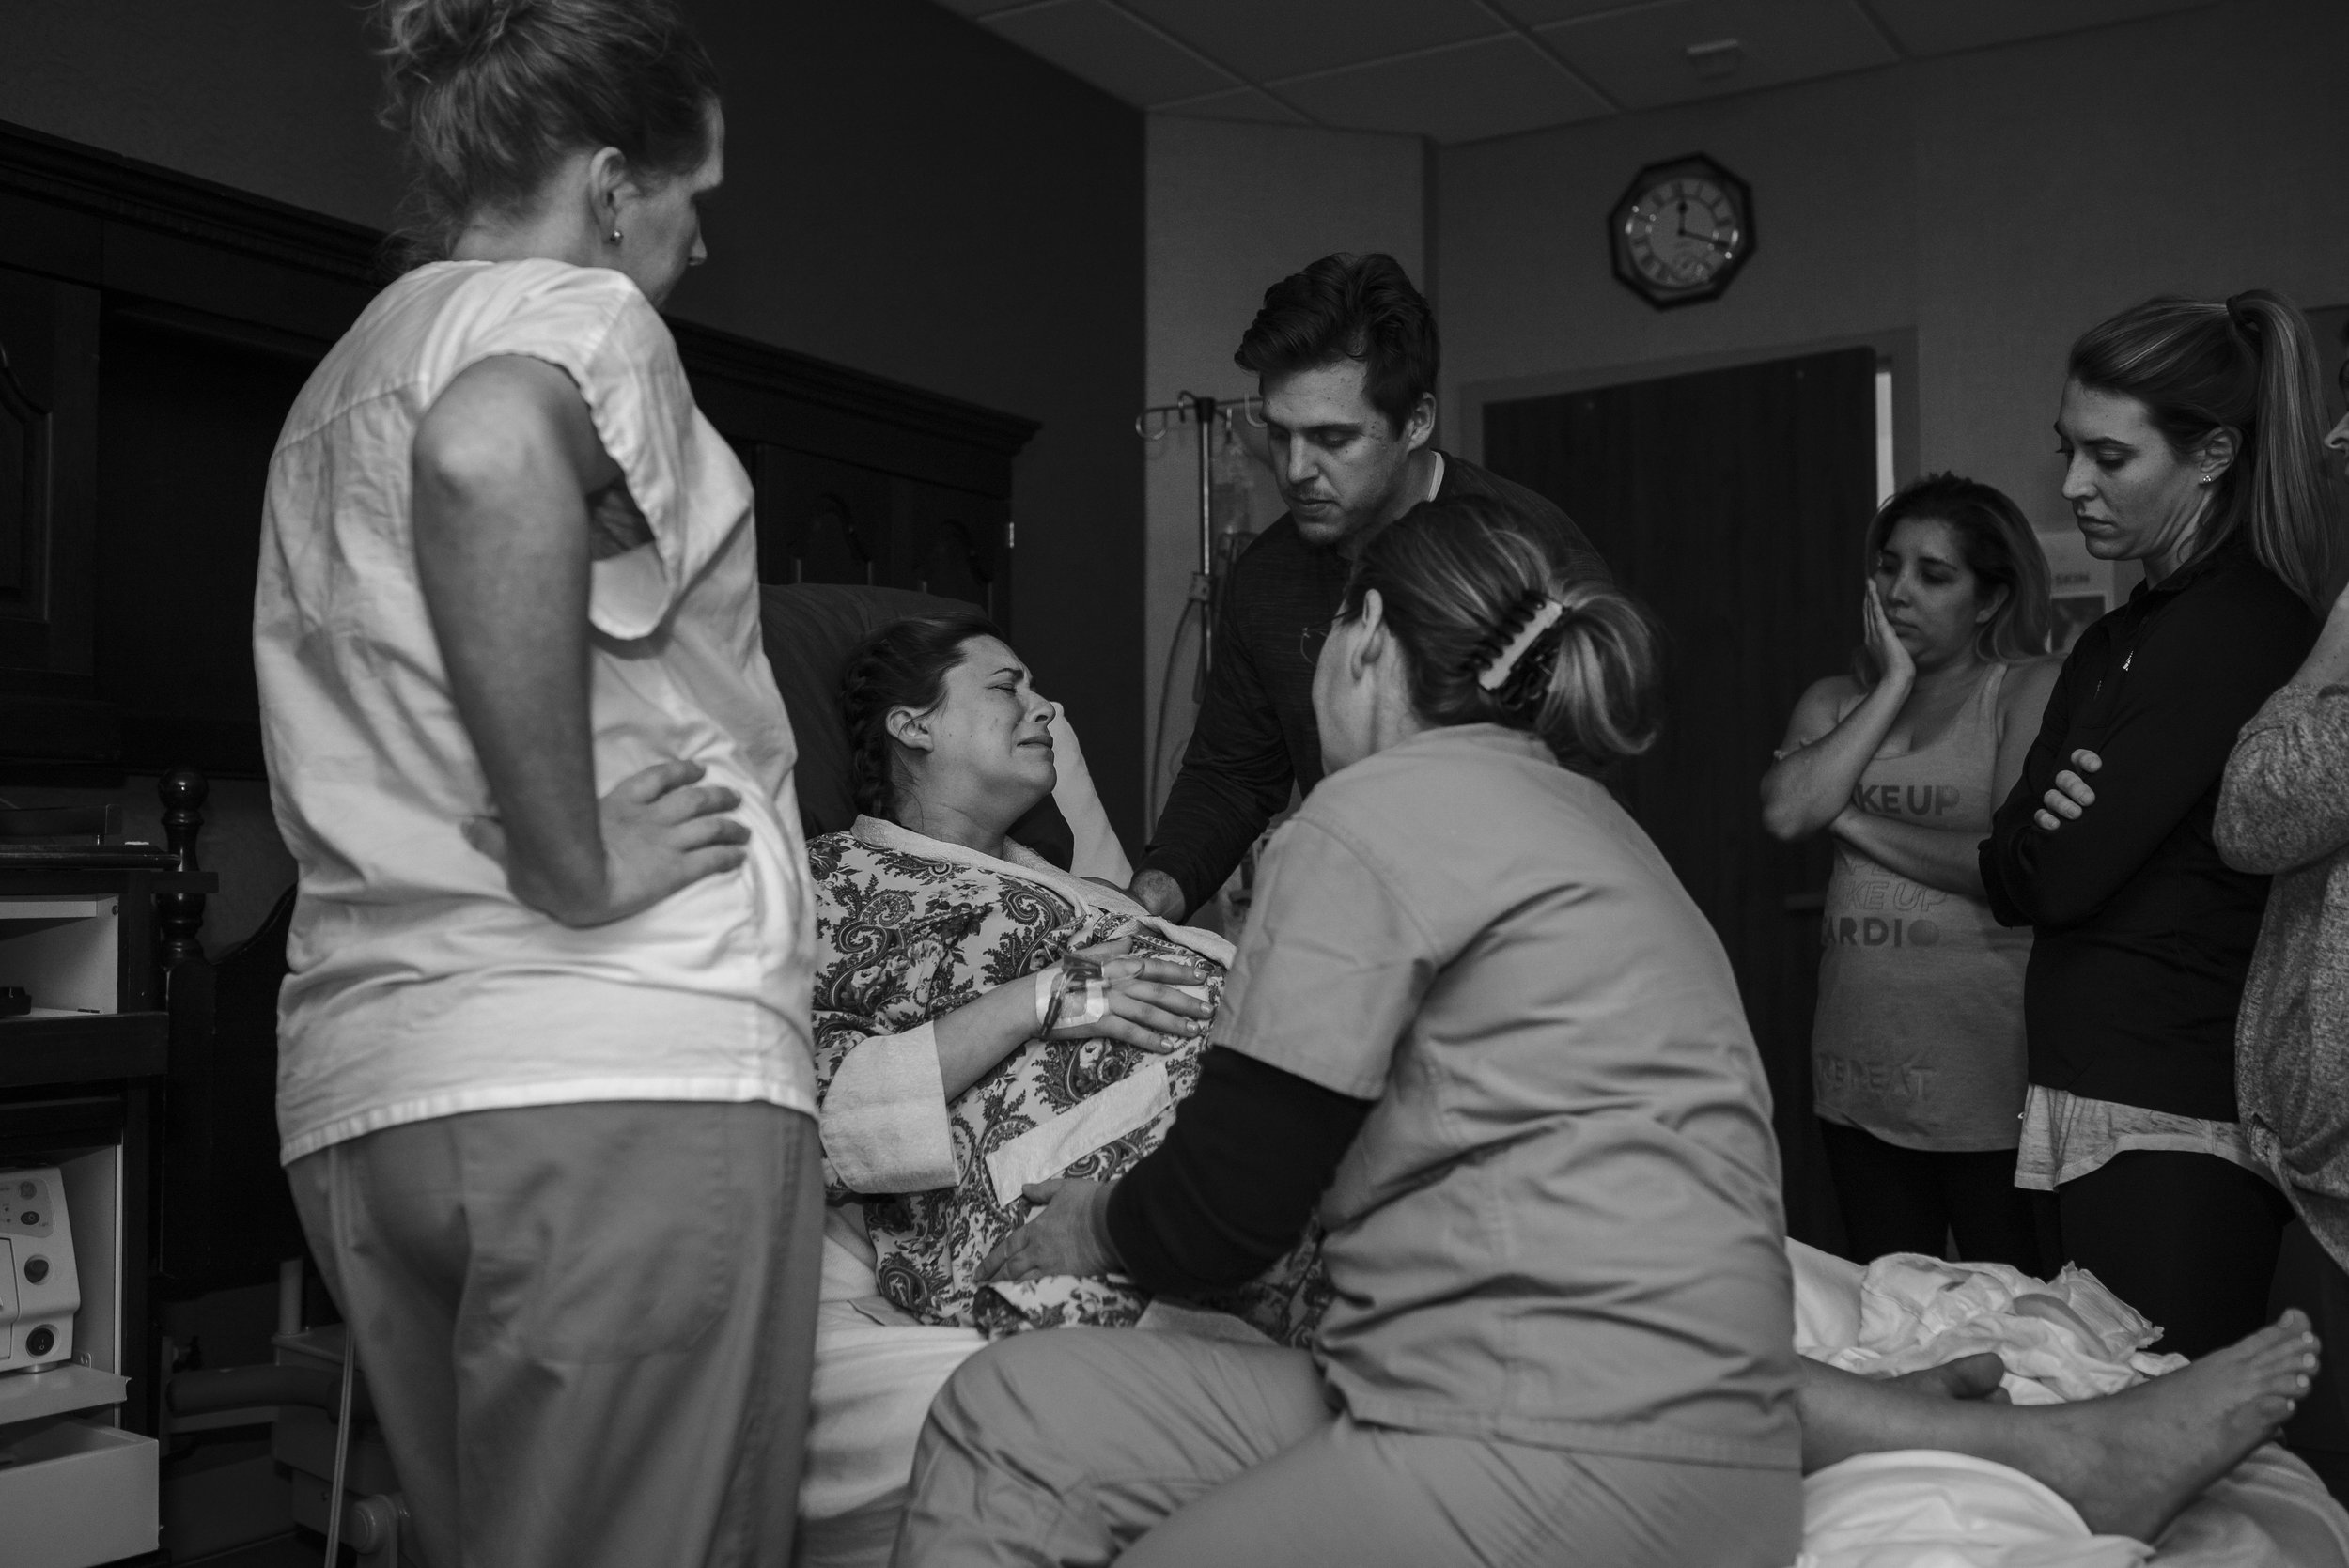 045-Full-Circle-st-vincents-southside-hospital-birth-jacksonville.JPG